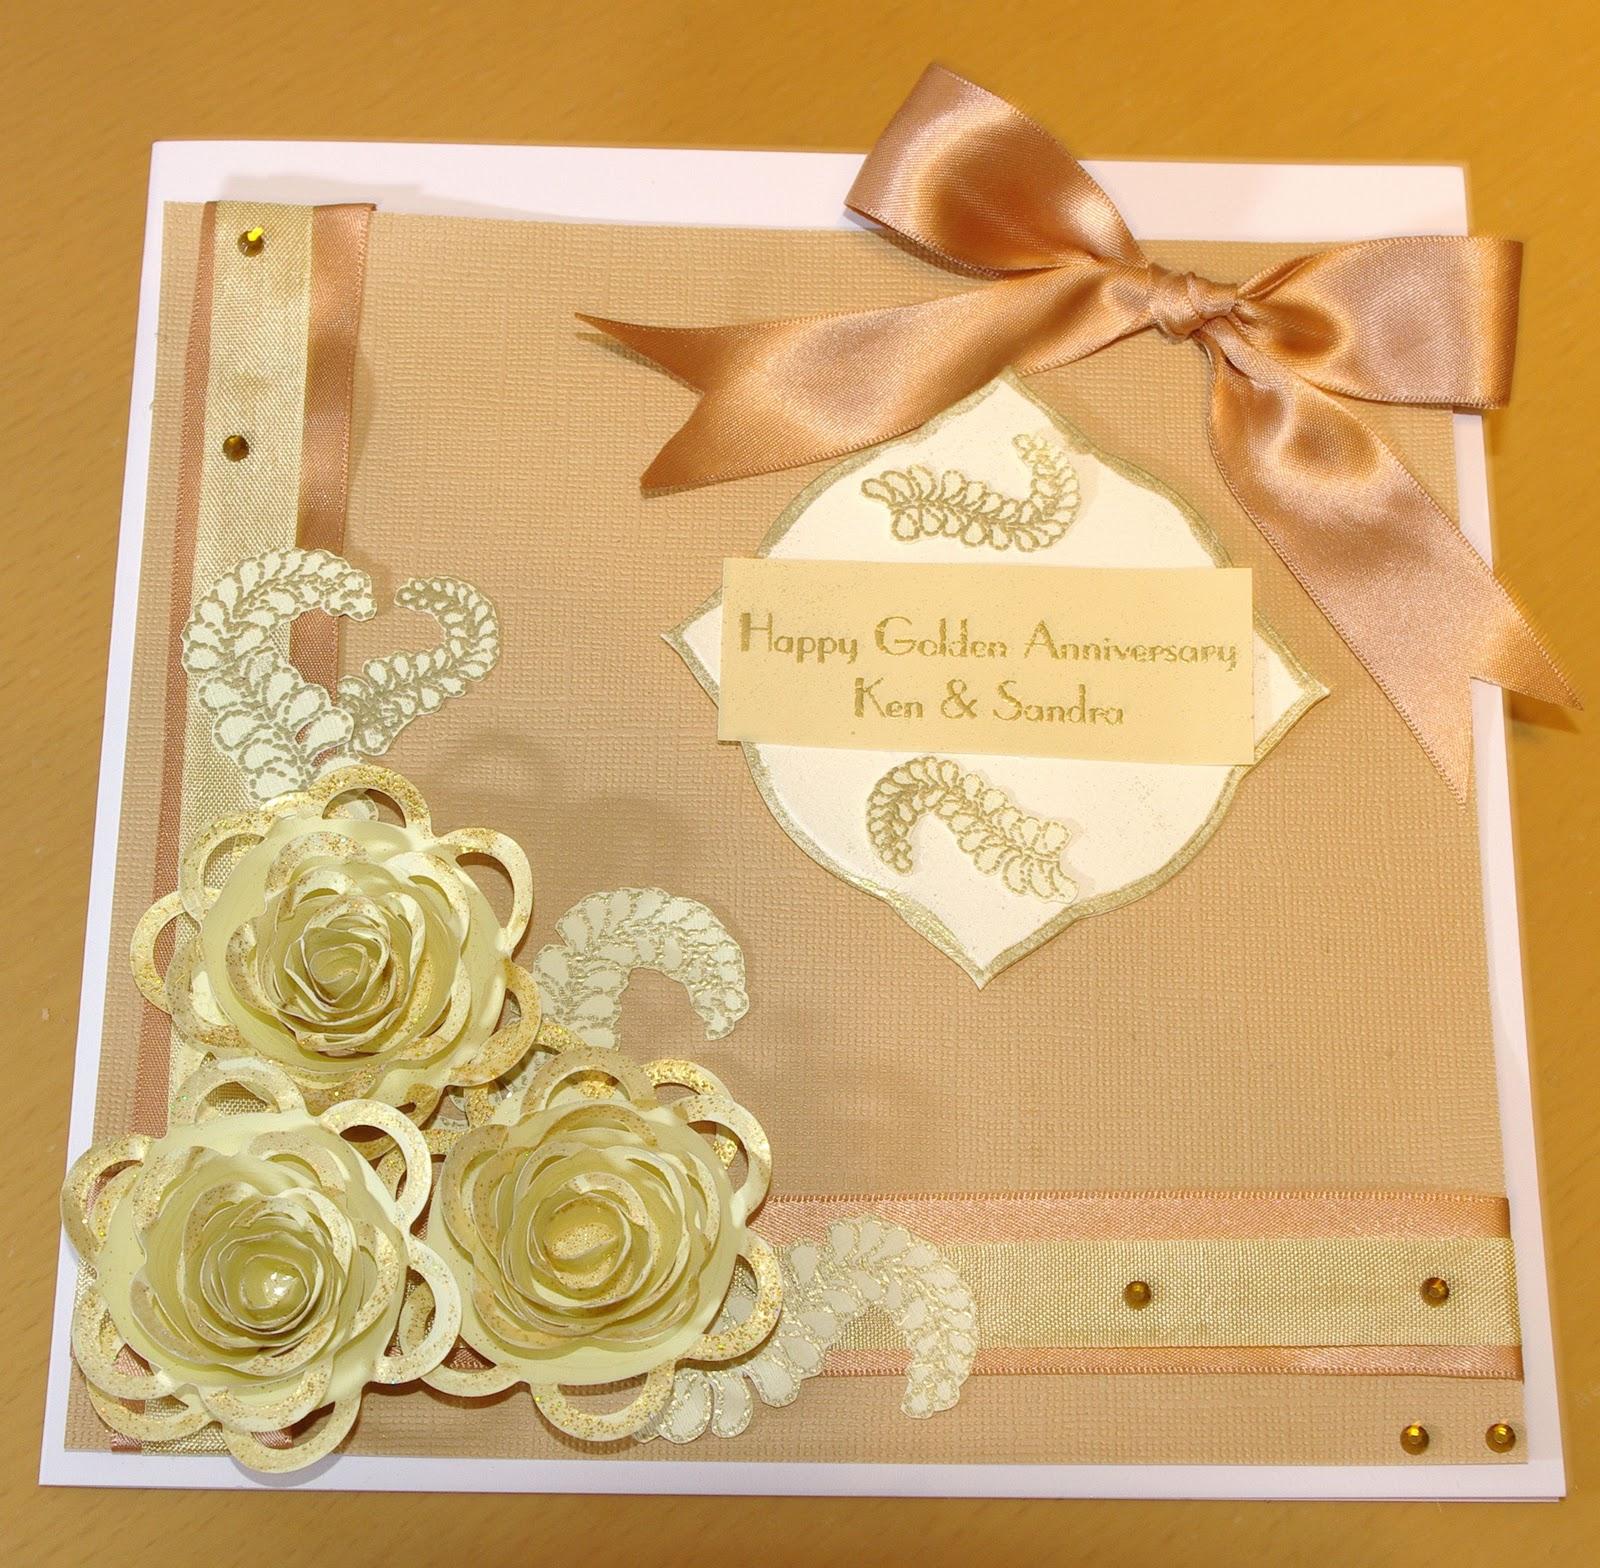 mowbray designs: golden wedding anniversary card